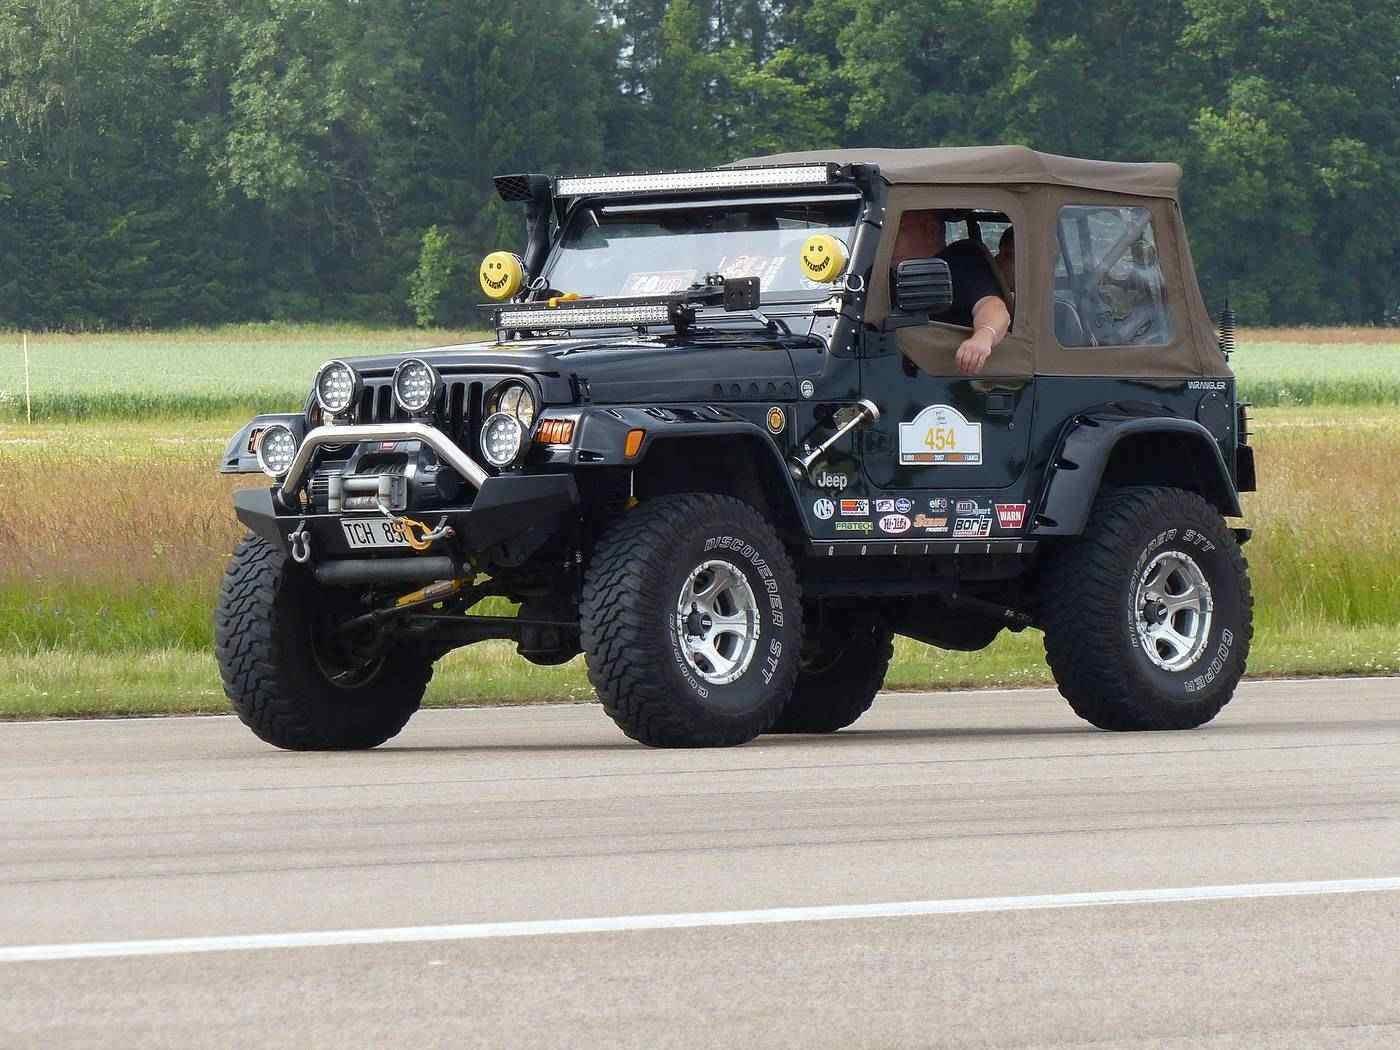 Jeep on road